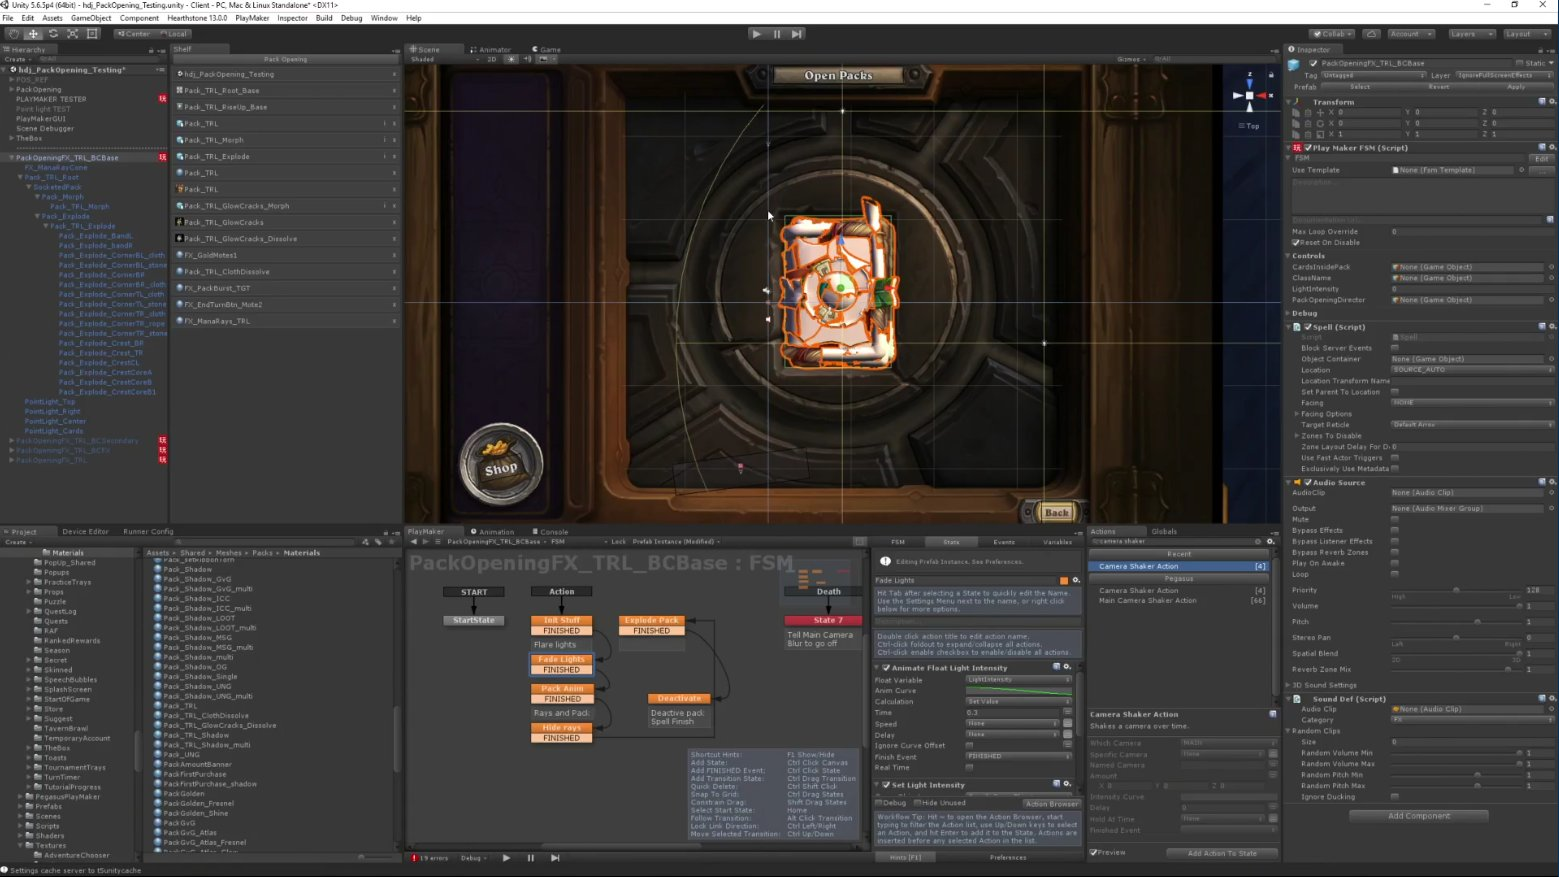 Hearthstone_EditorScreen.jpg